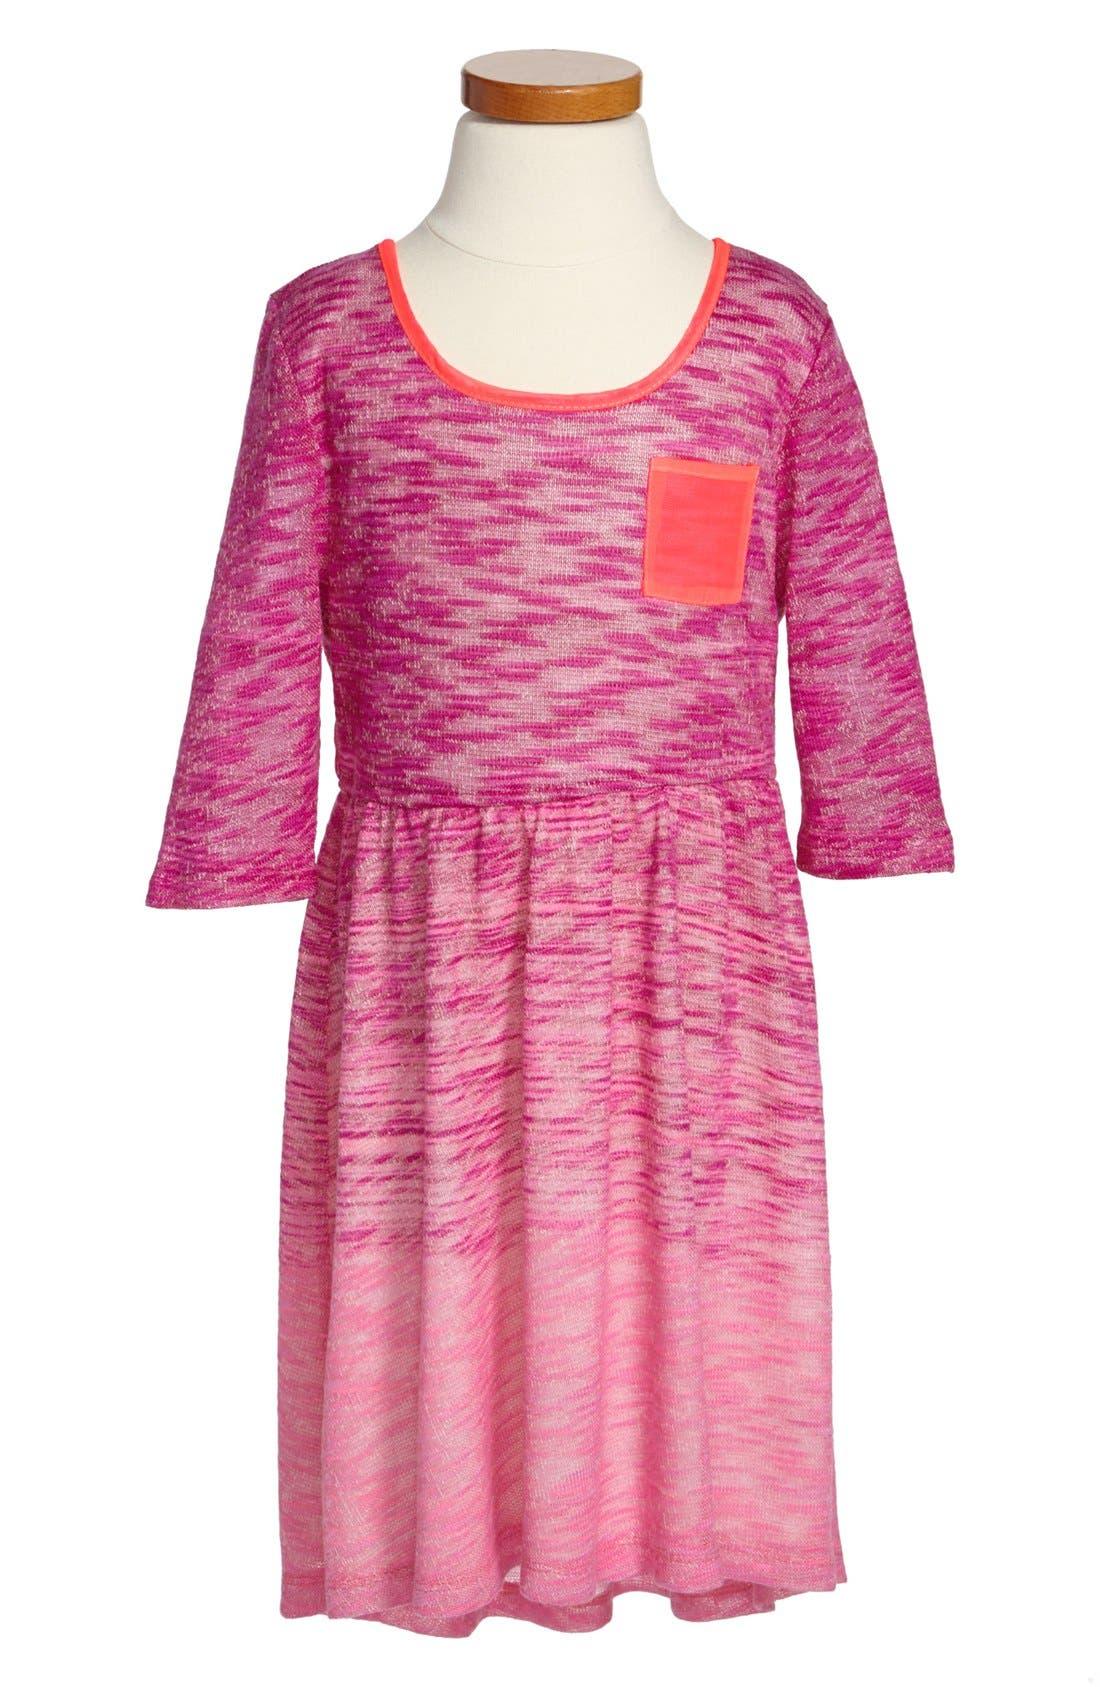 Main Image - W Girl Patch Pocket Ombré Dress (Little Girls & Big Girls)